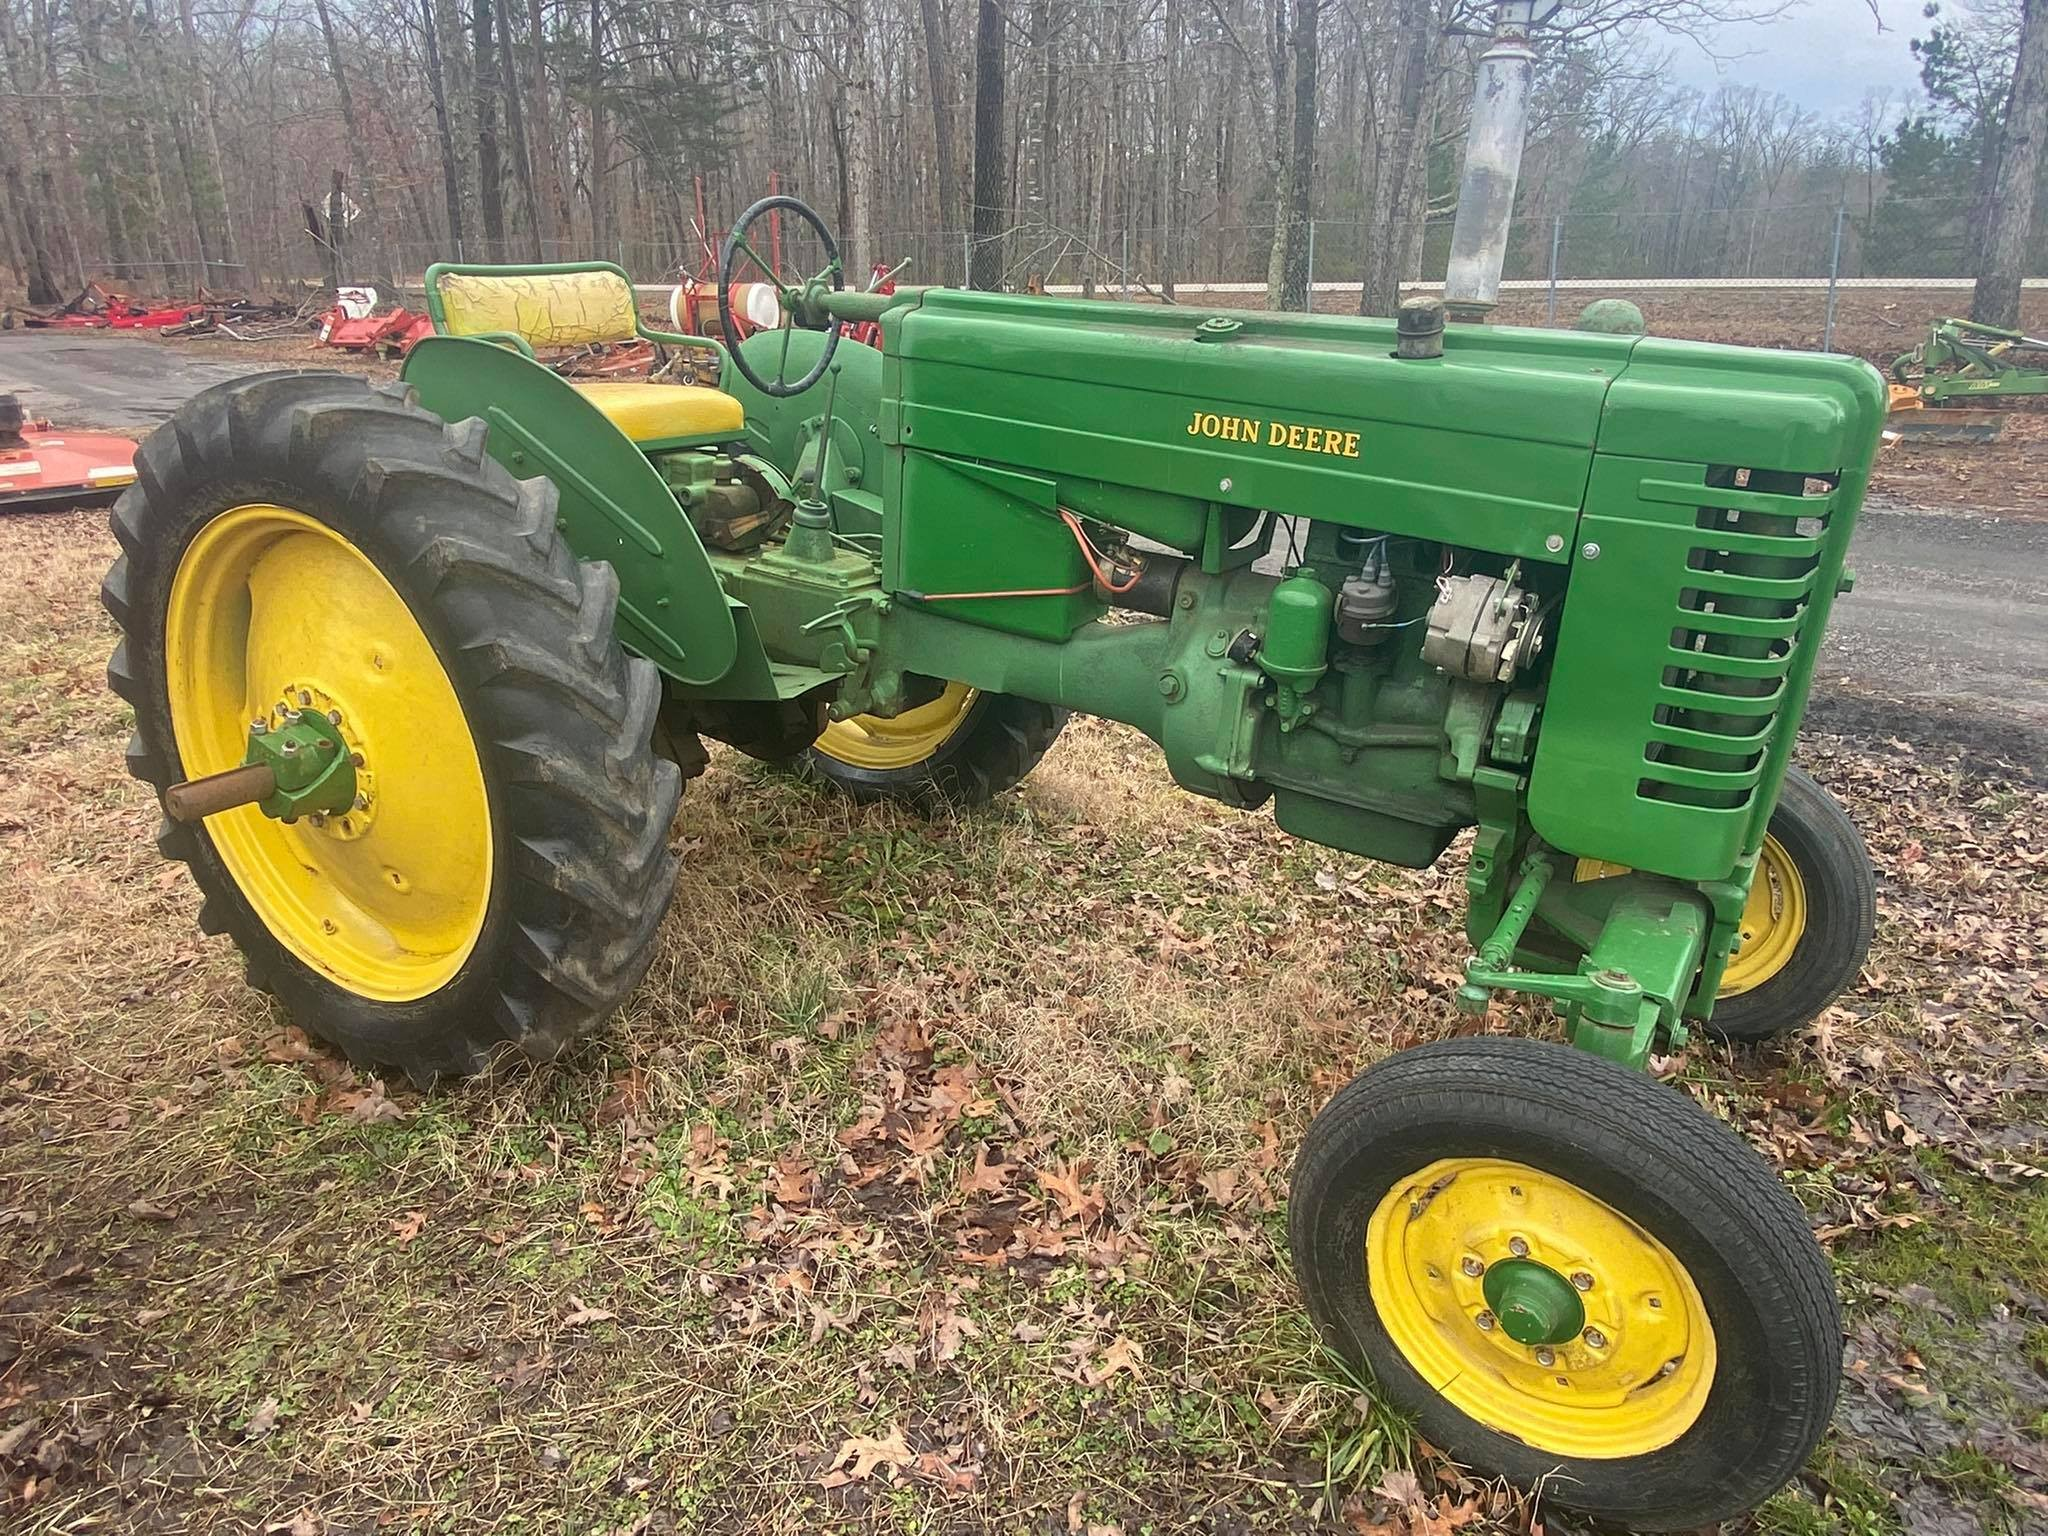 Used, 0, John Deere, 2 Cylinder , Tractors